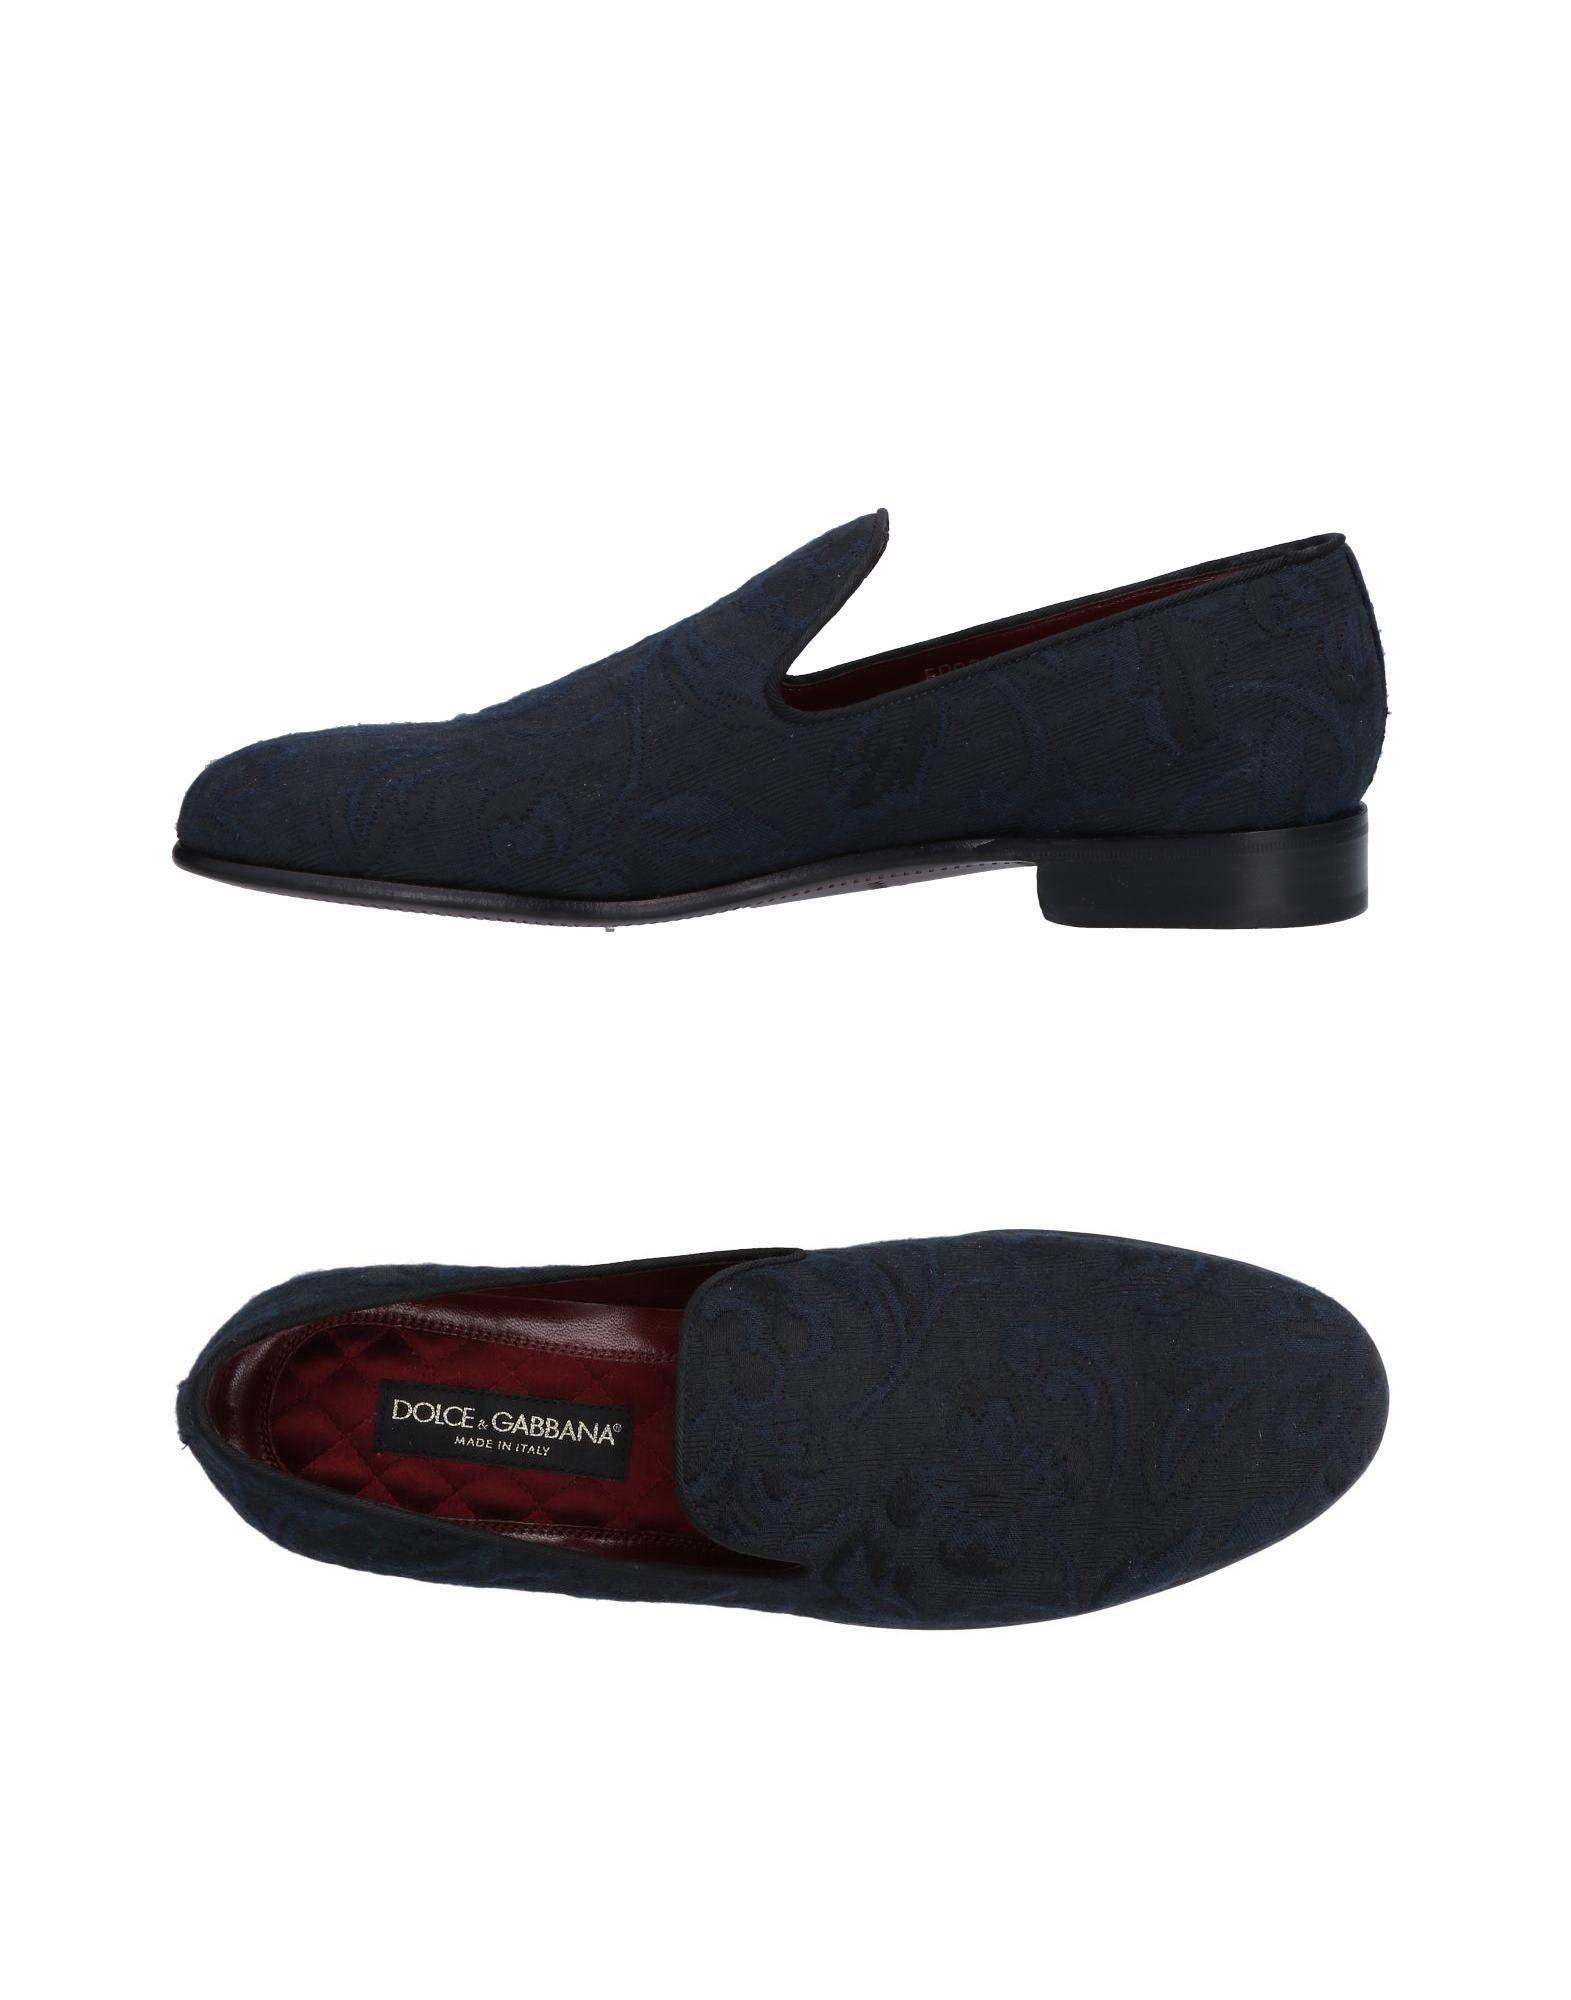 Dolce & Gabbana Mokassins Neue Herren  11492502JE Neue Mokassins Schuhe ef2f89